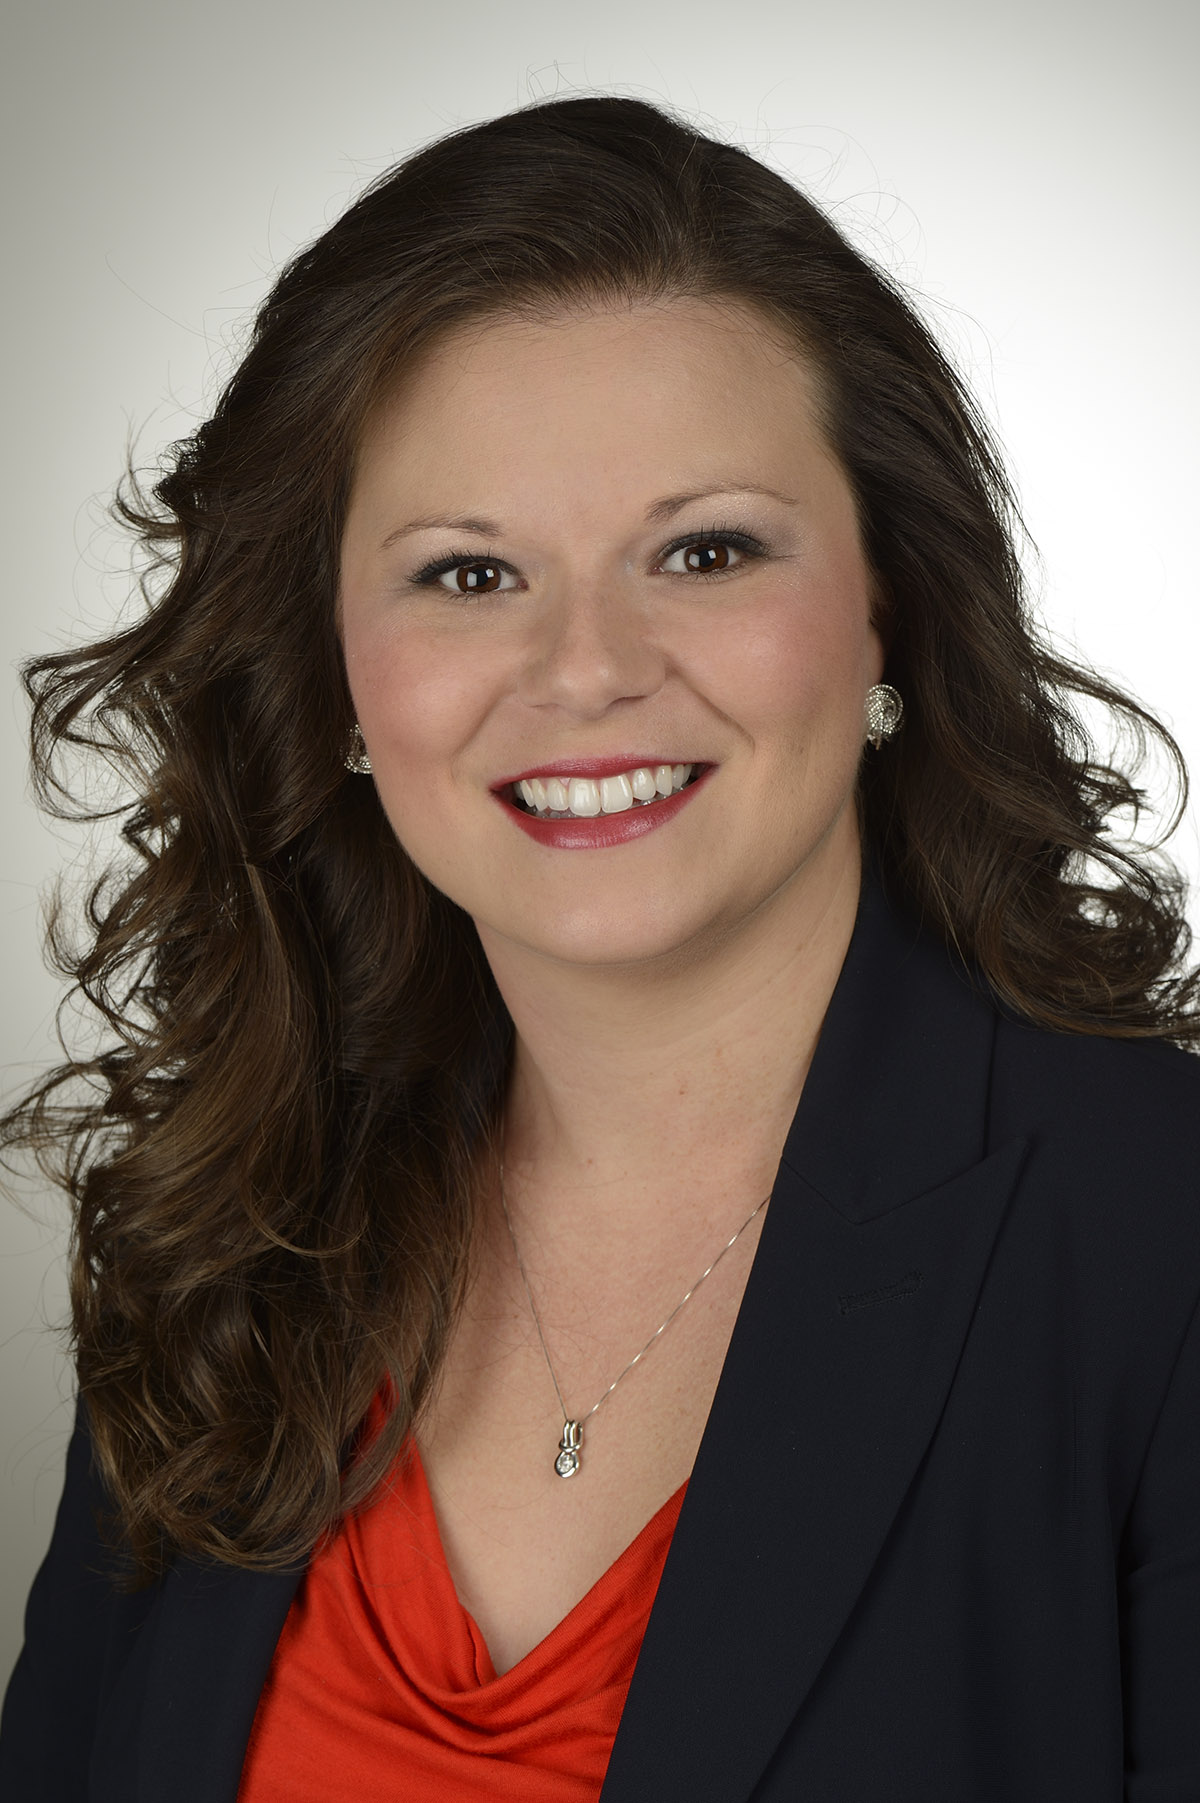 Photo of Natalie Gupton